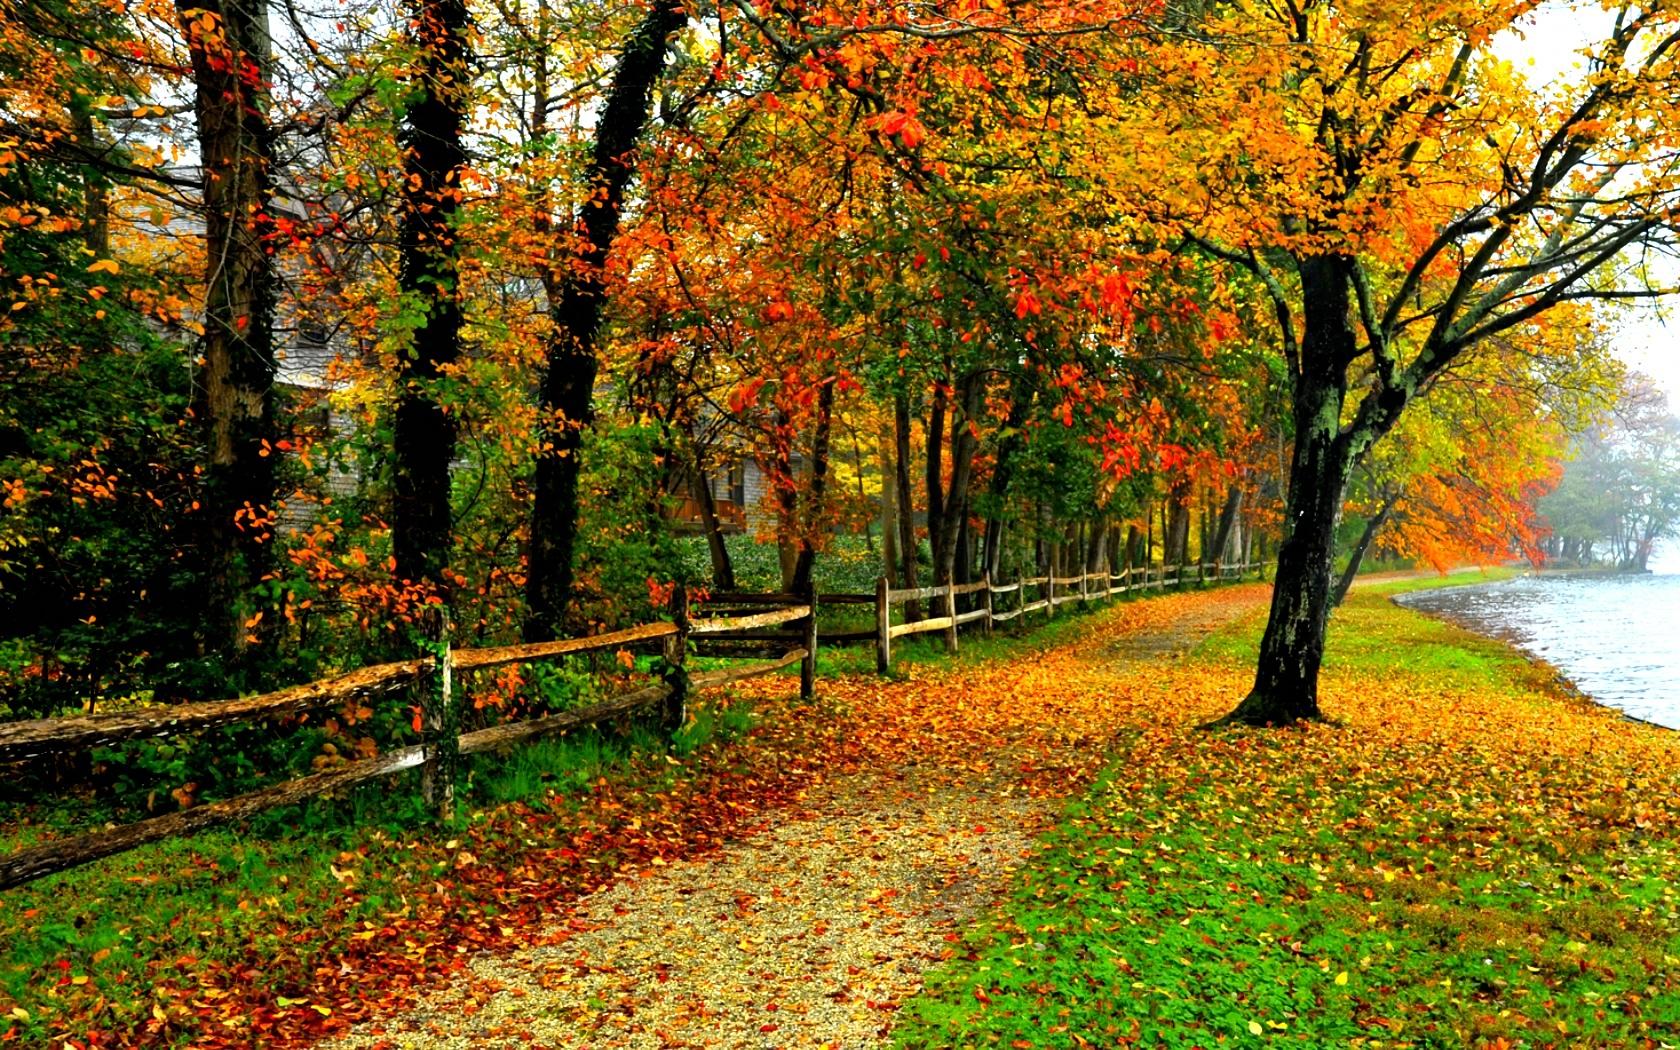 Autumn Sidewalk Wallpaper and Background Image | 1680x1050 ...